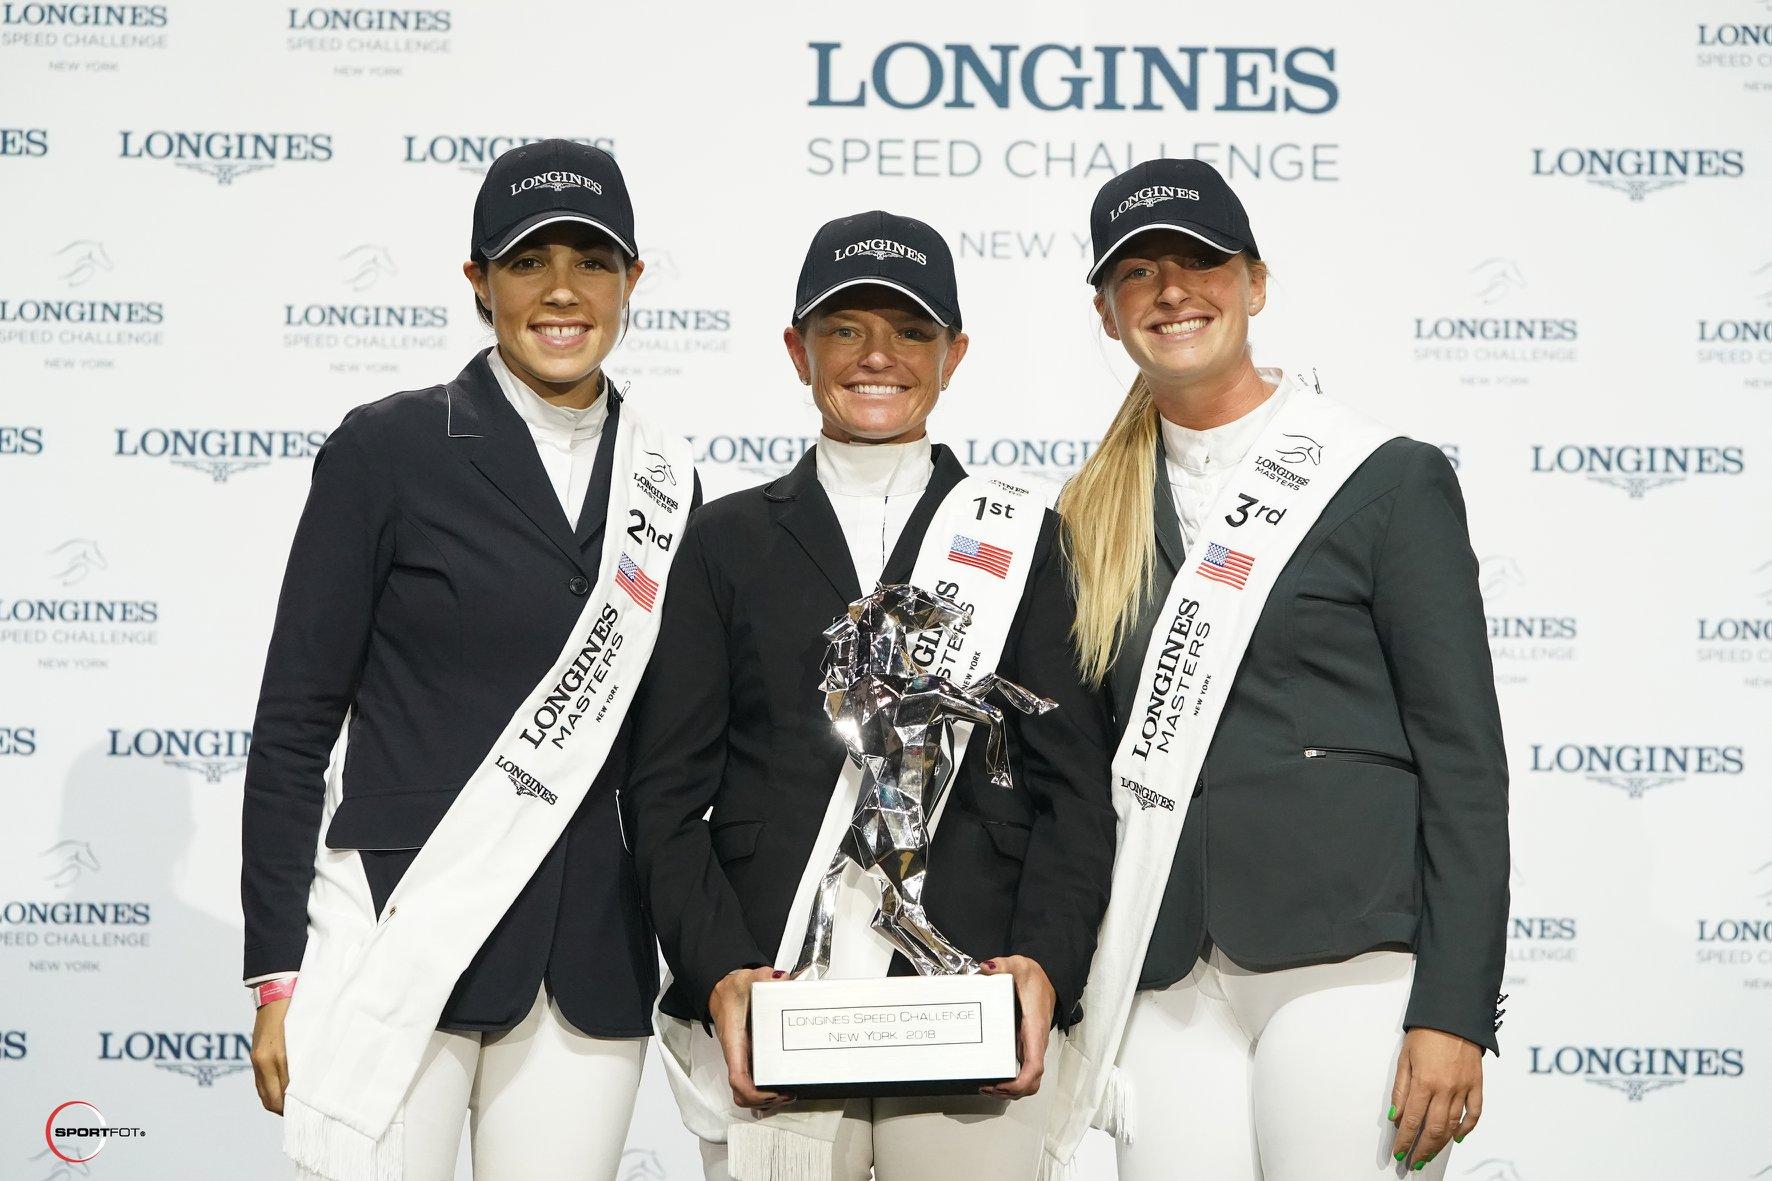 Brianne Goutal-Marteau, Erynn Ballard and Kristen Vanderveen earned the top three spots in the Longines Speed Challenge in 2018. Photo by SportFot